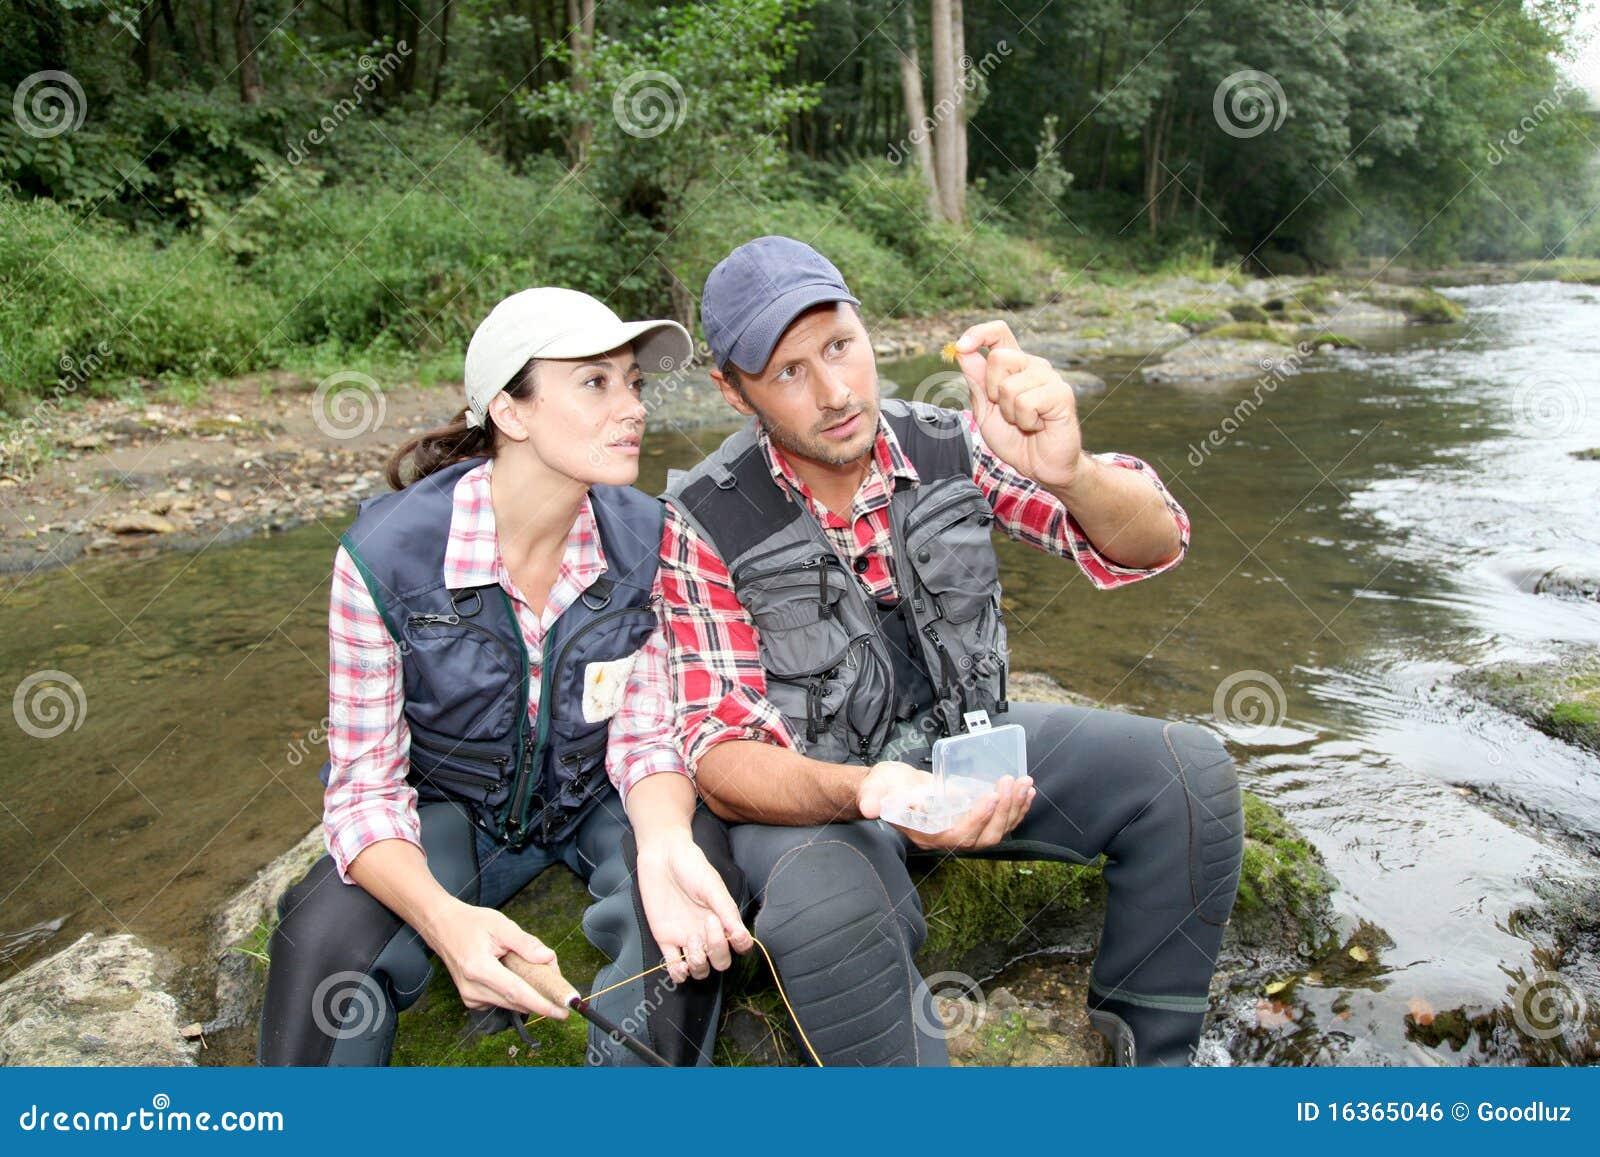 Ribolov na fotkama - Page 2 Couple-river-fishing-day-16365046